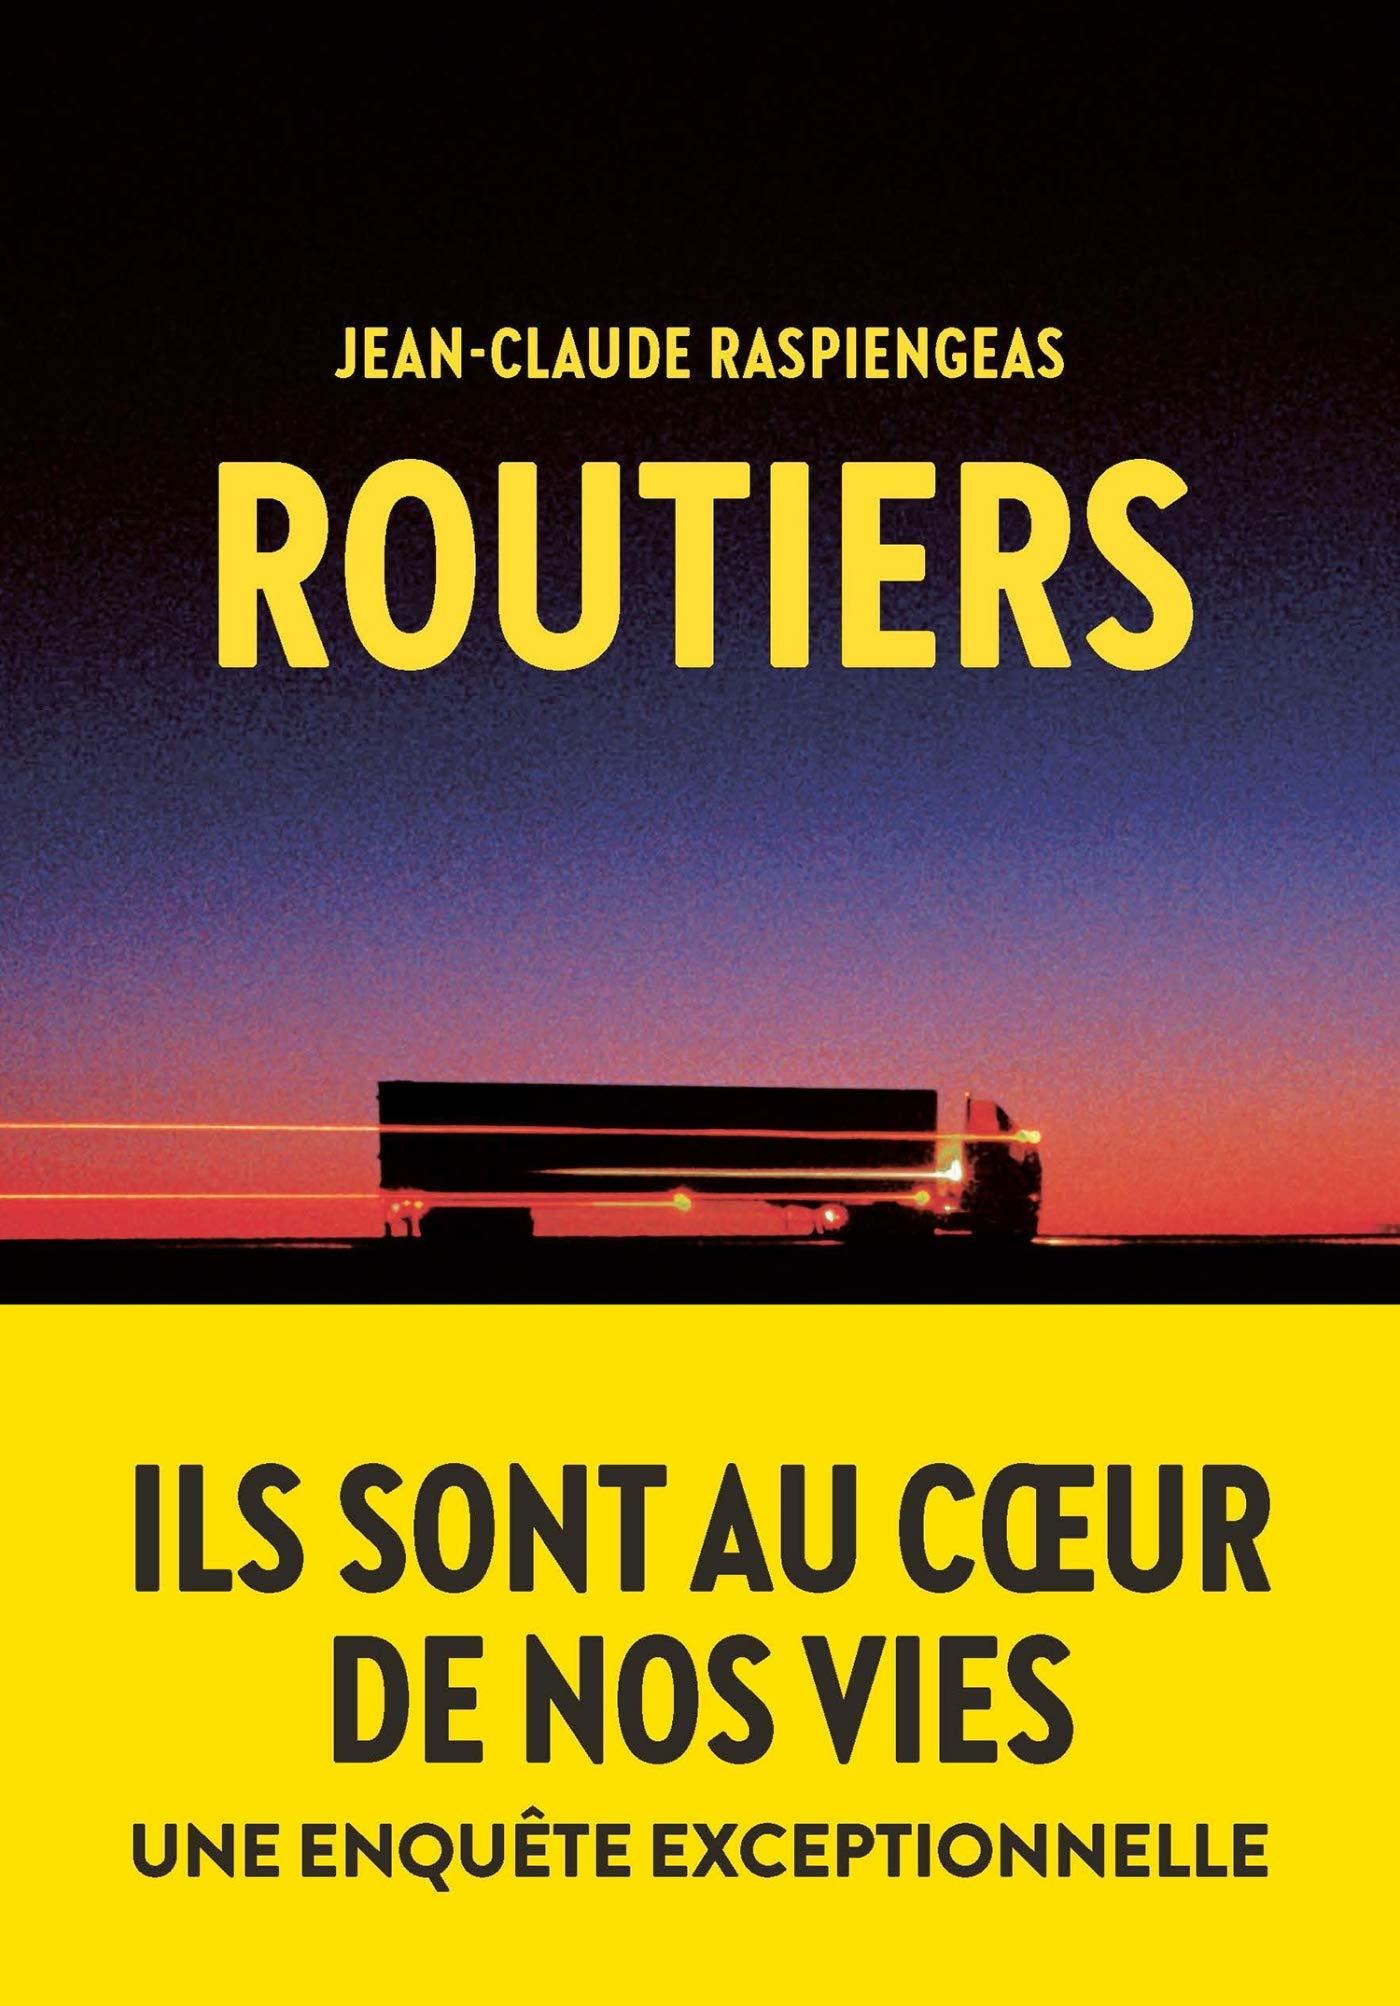 Amazon.fr - Routiers - Raspiengeas, Jean-Claude - Livres